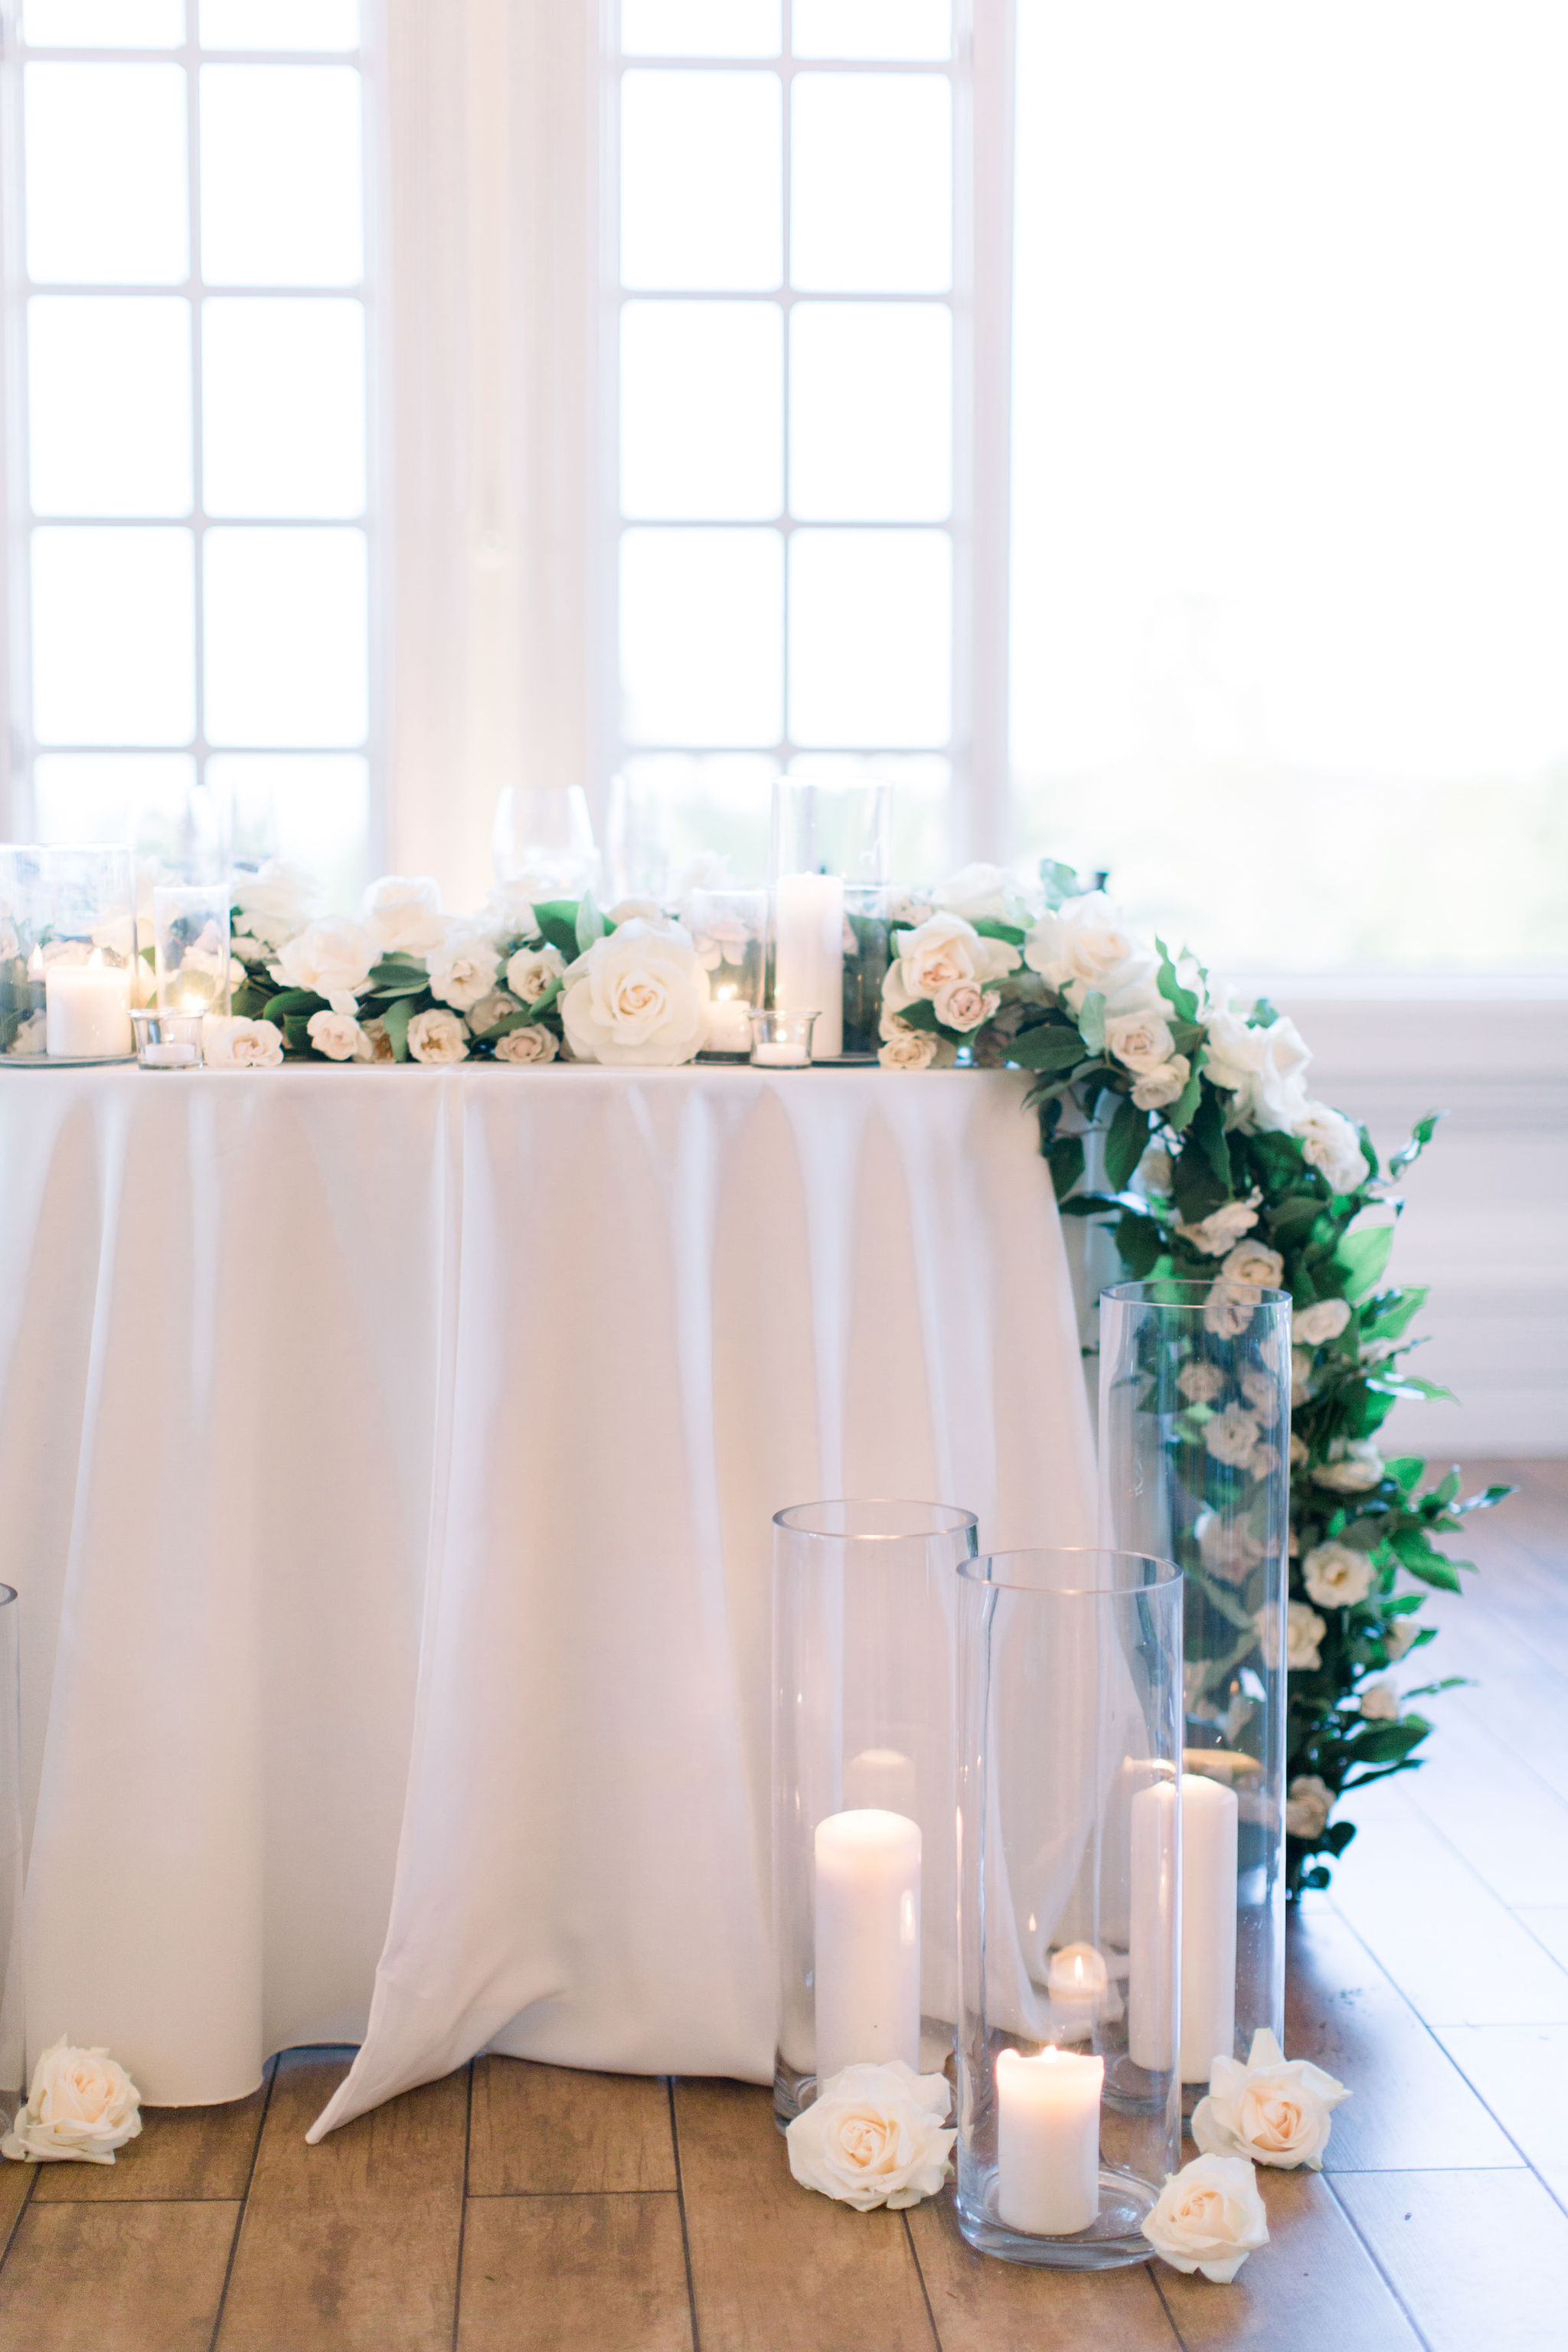 sydney-bodi-wedding-budget-friendly-blooms-carmel-mountain-white-flowers-11.jpg